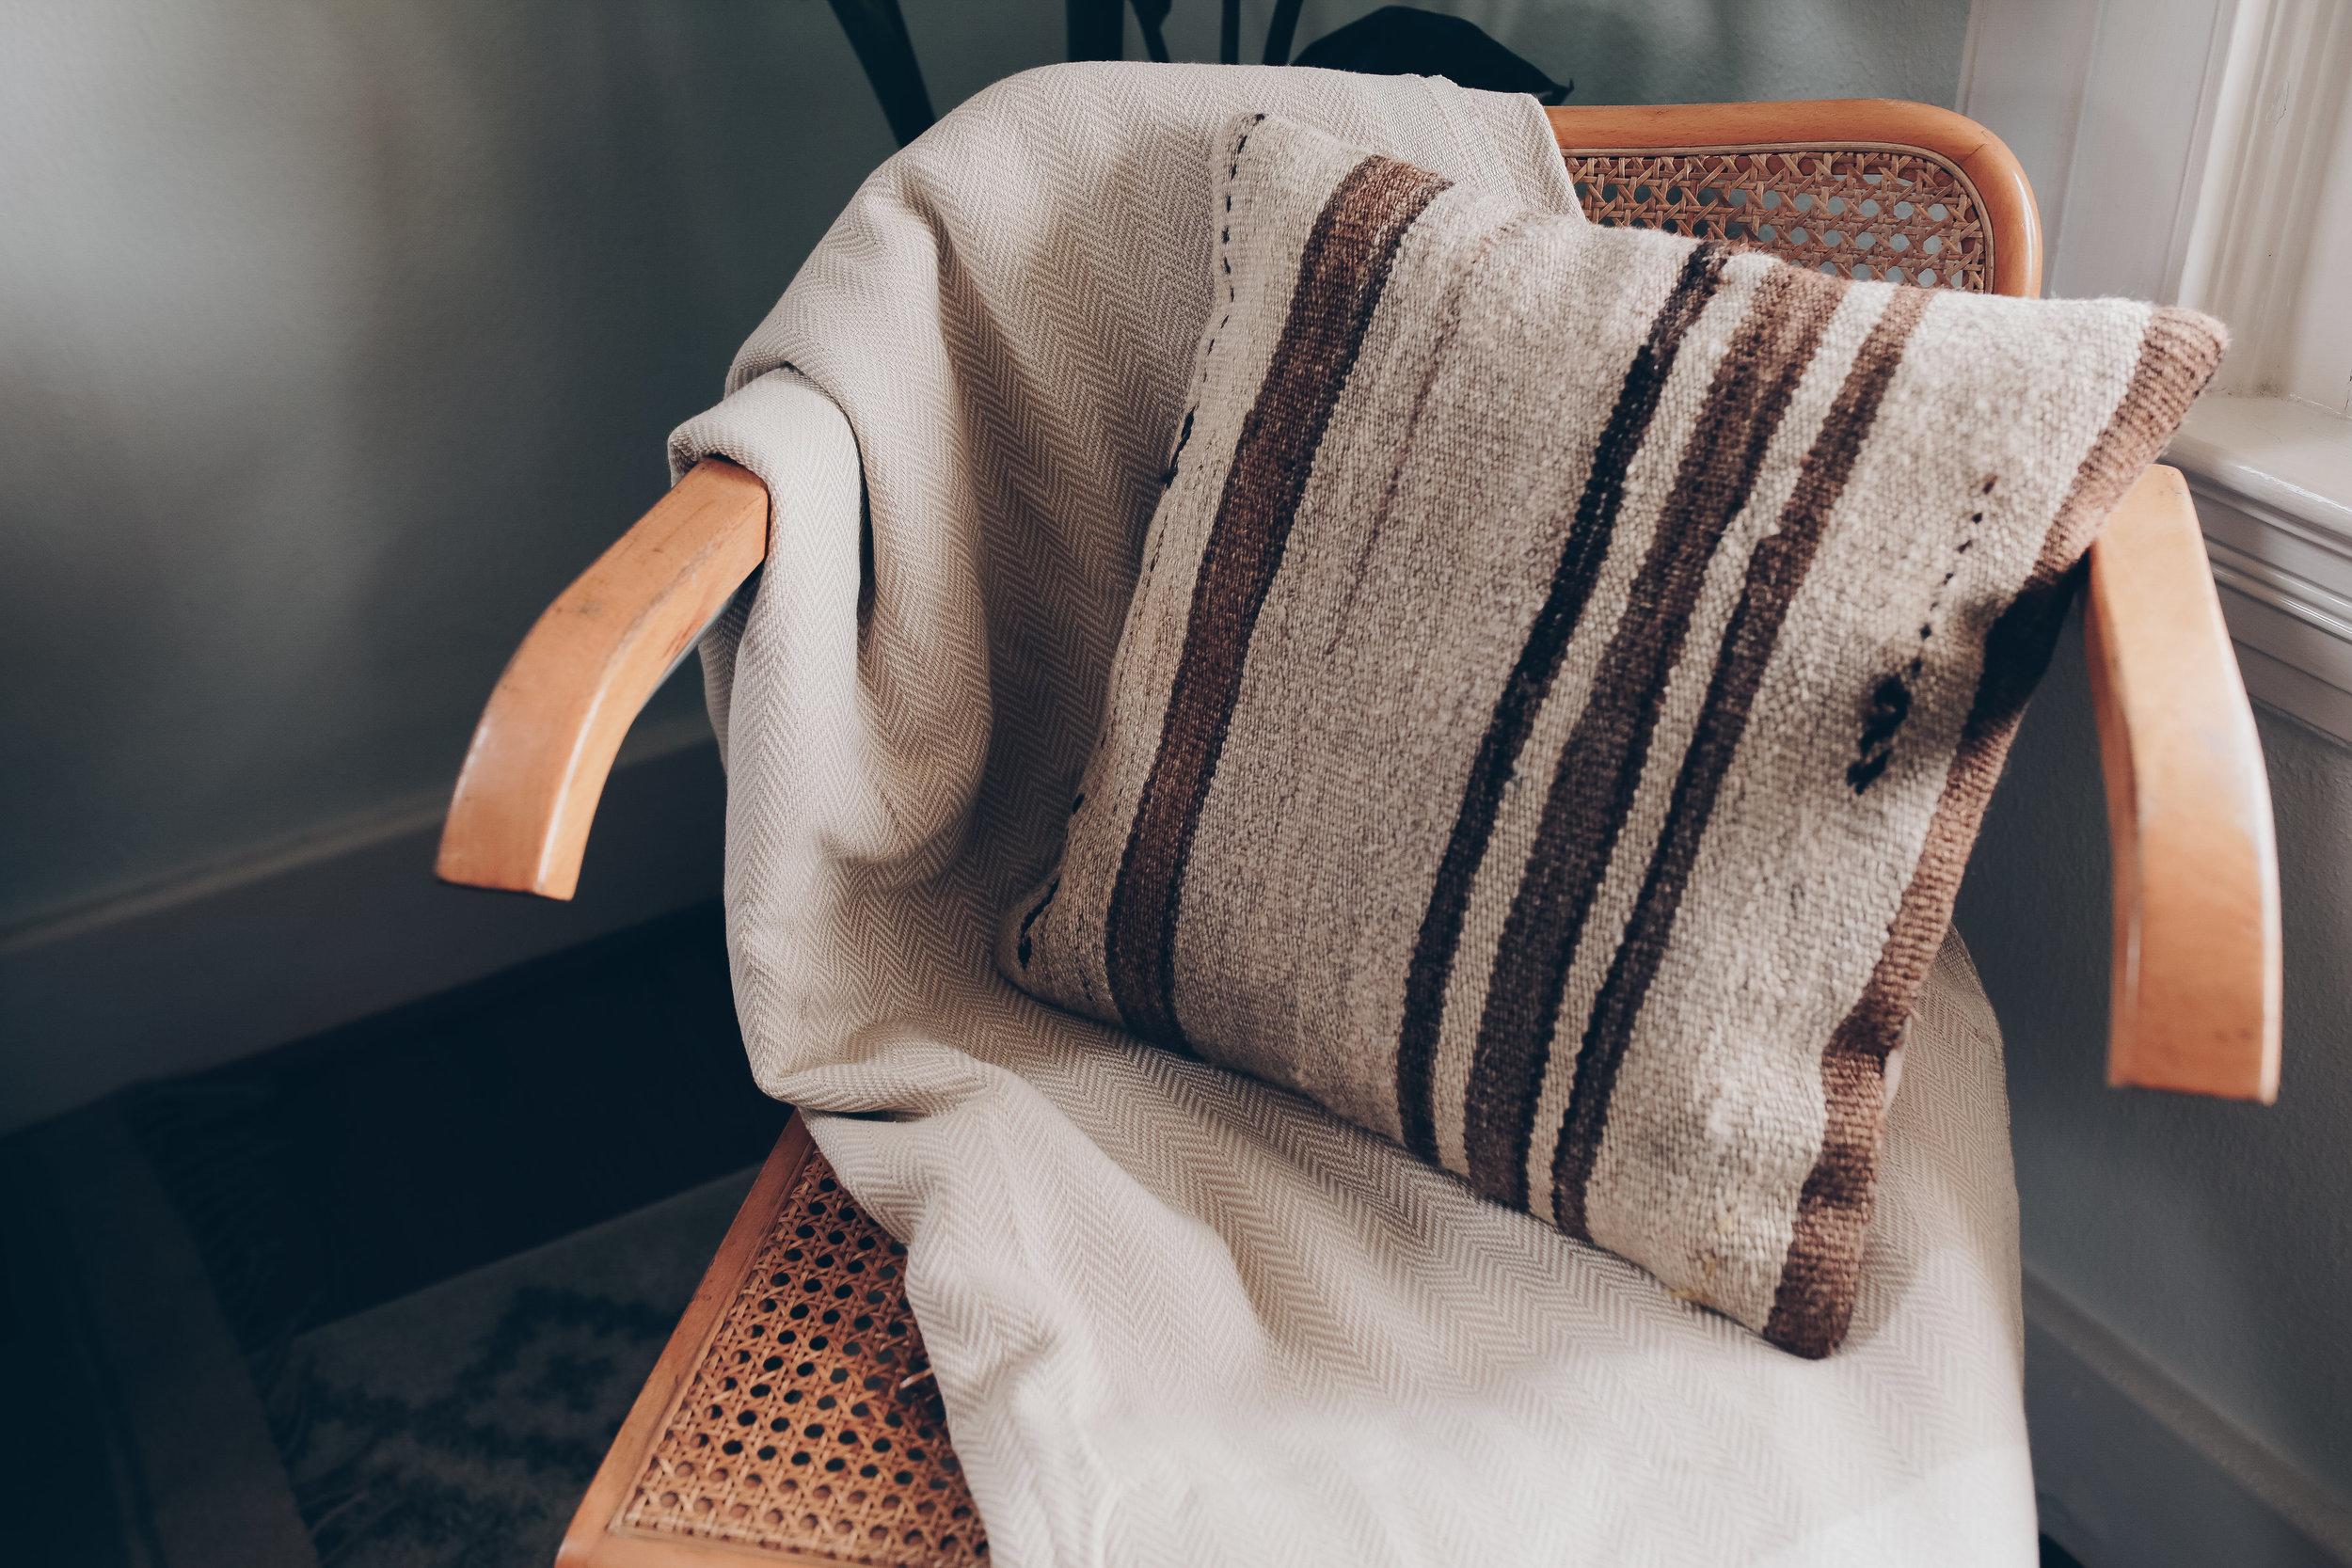 kilim pillows from foragedhome.com